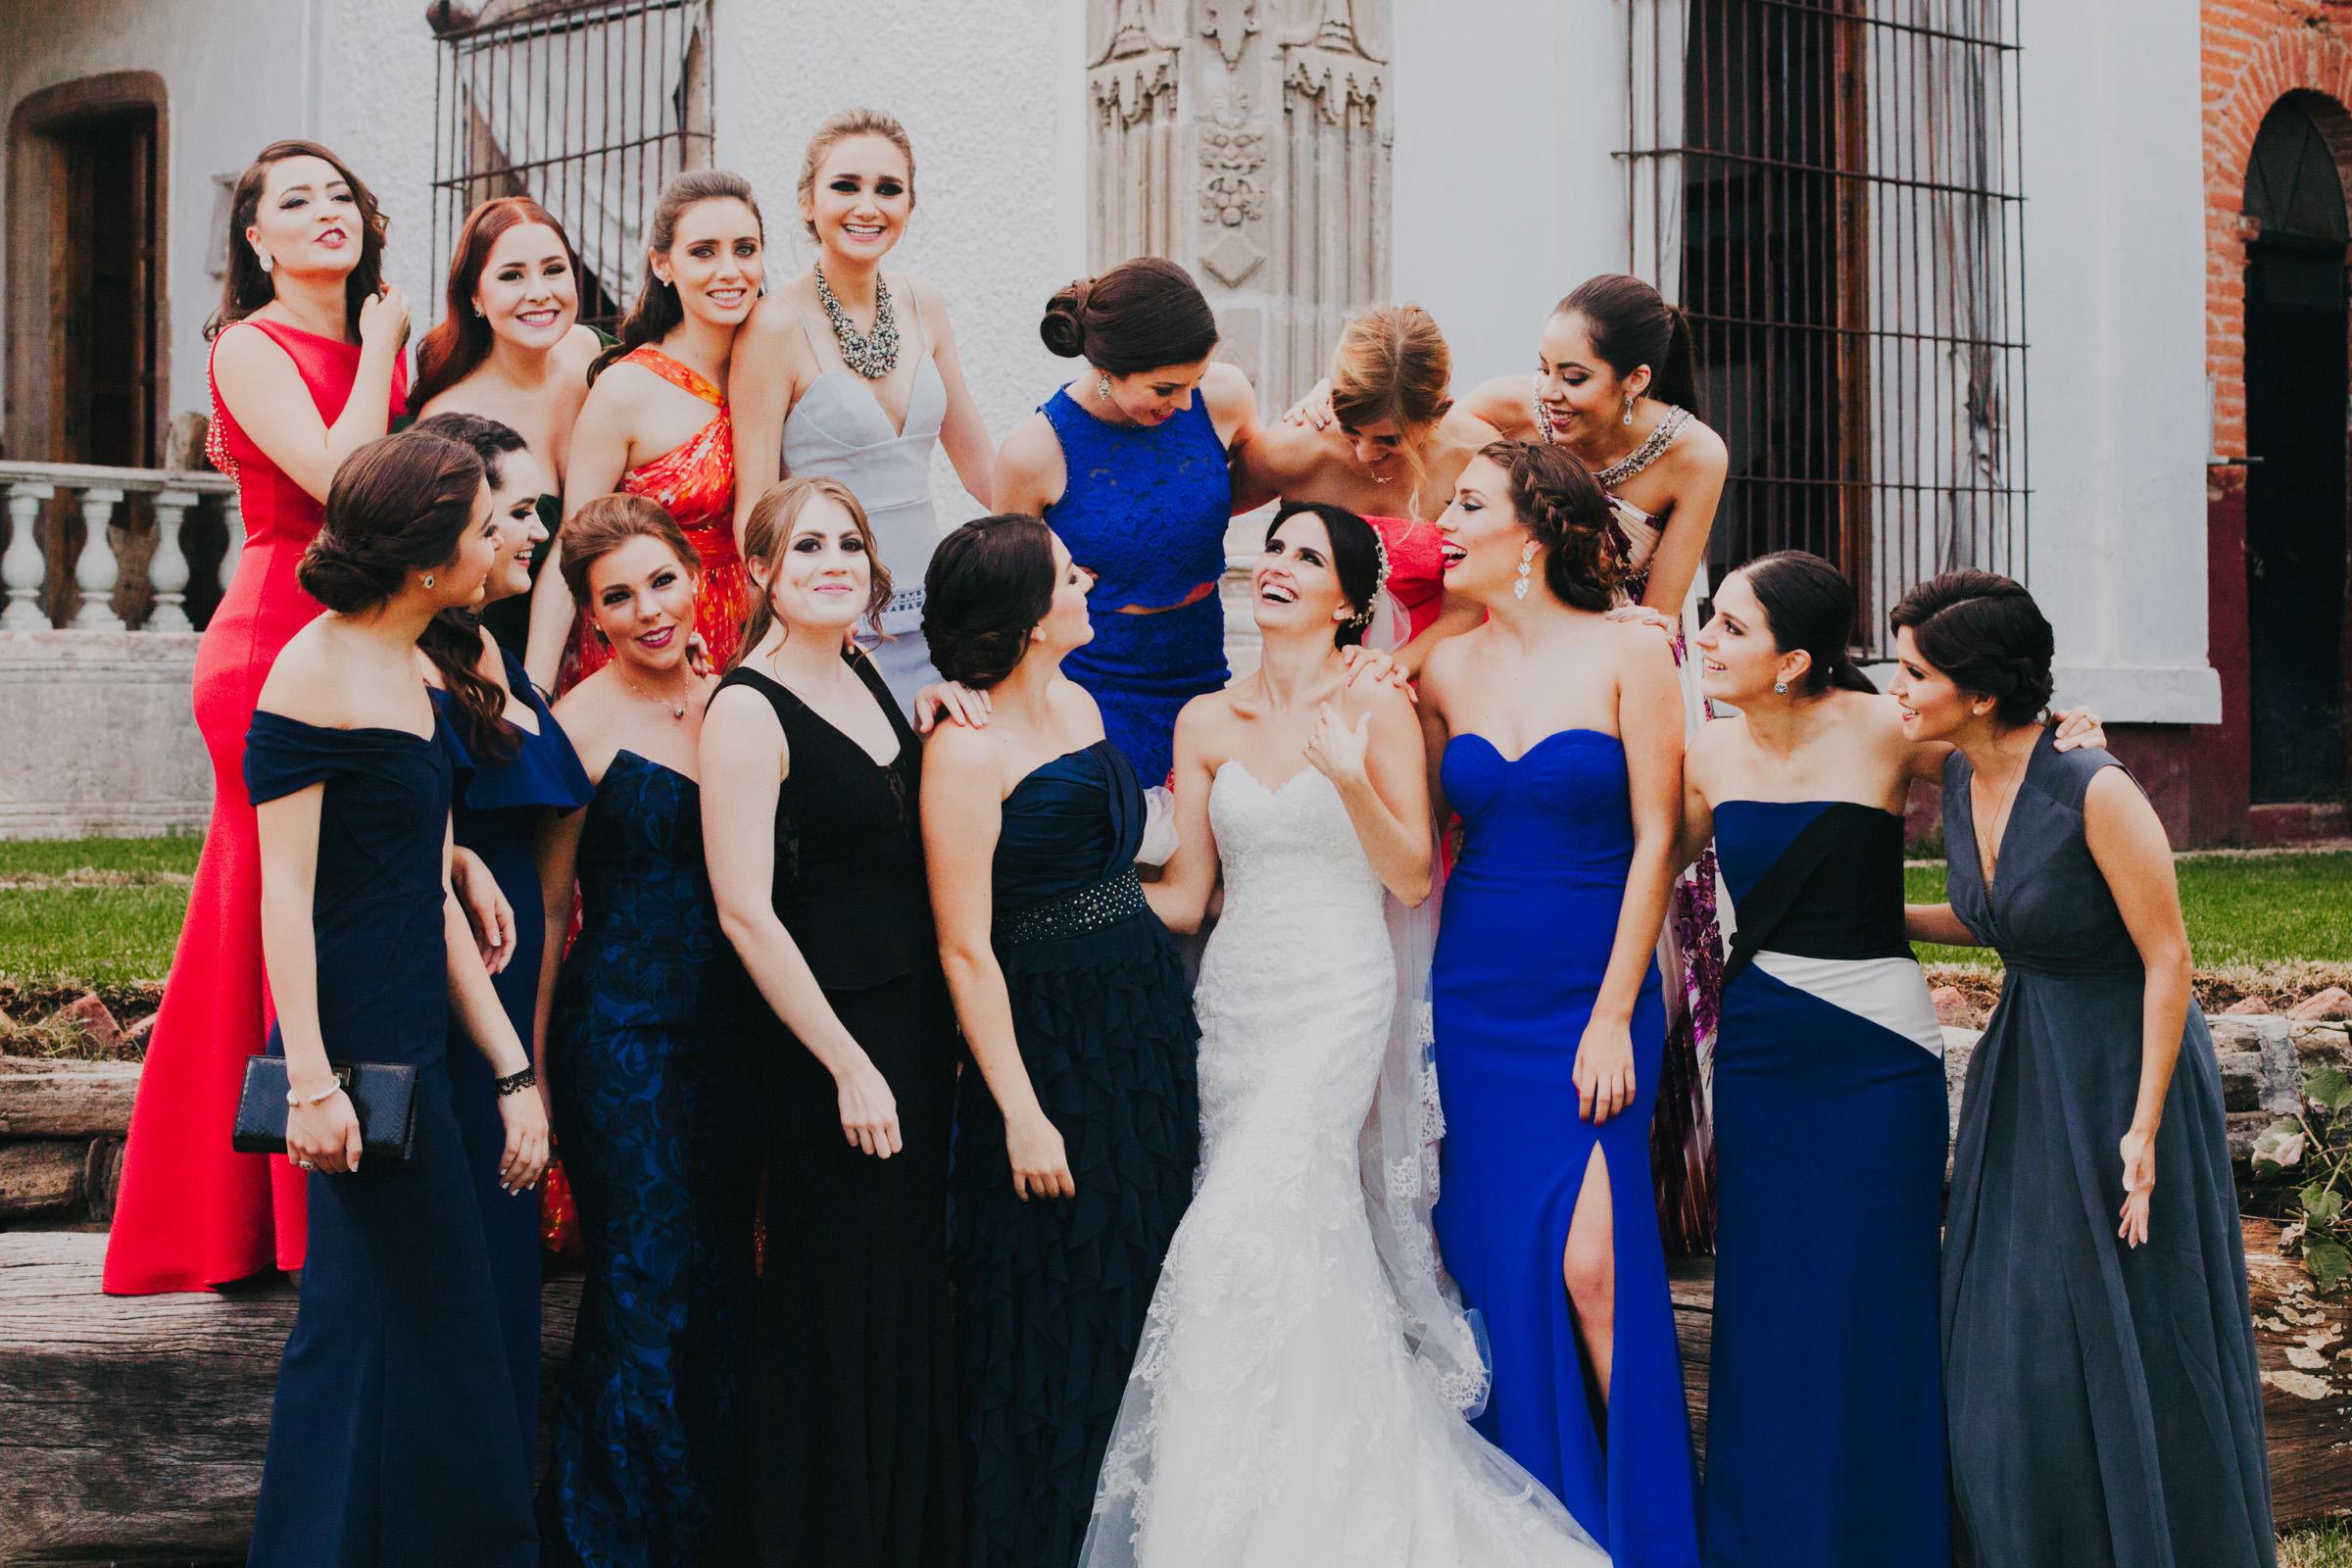 irapuato-boda-fotografia-jardines-alcalde-guanajuato-paulina-juan-pedro--96.jpg